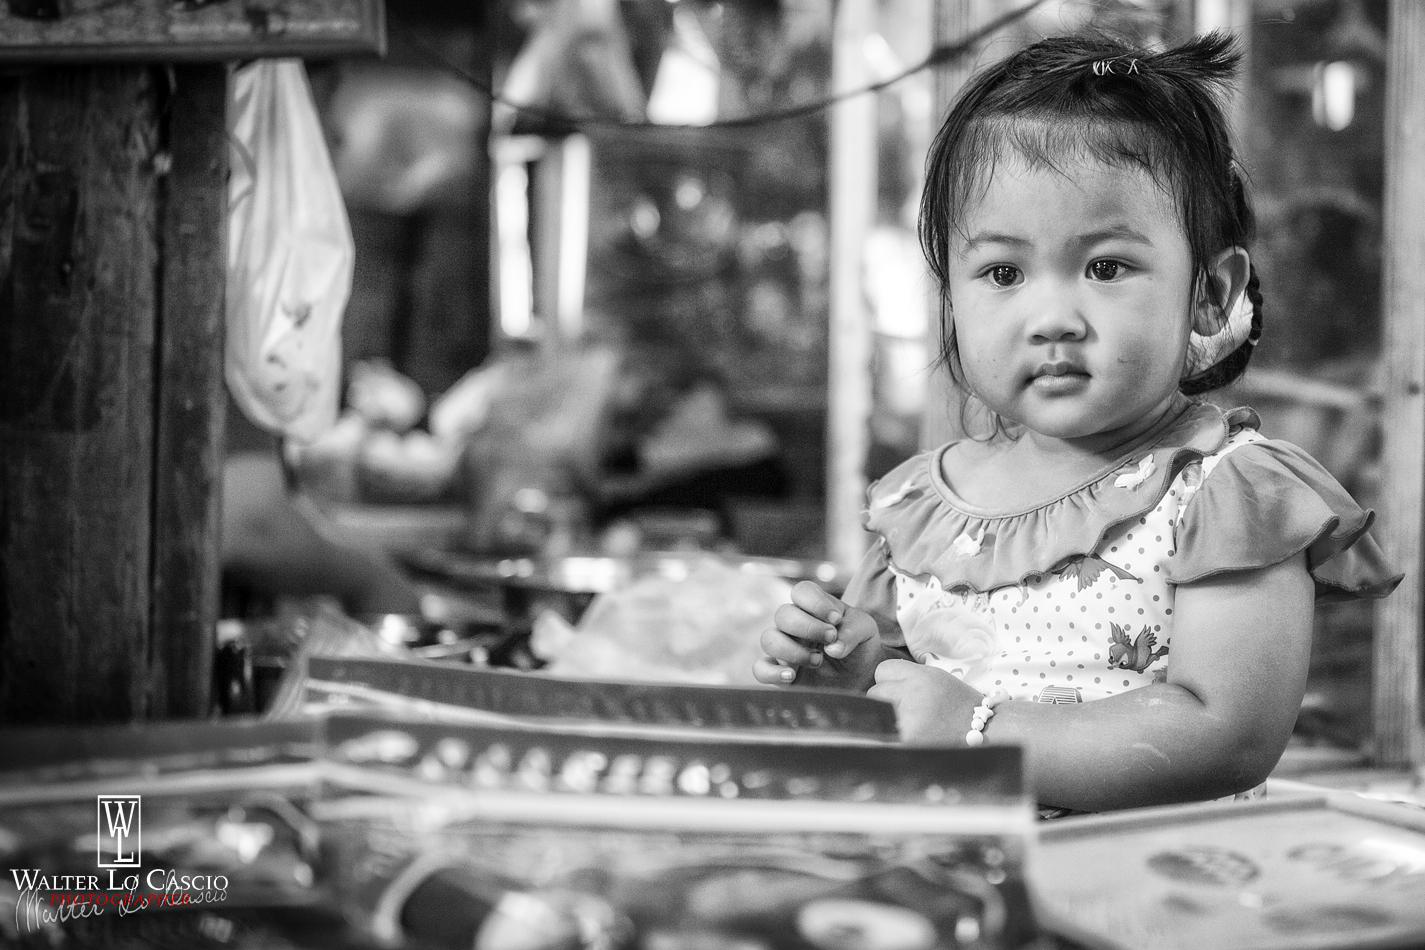 thailandia-2014_15793176017_o.jpg